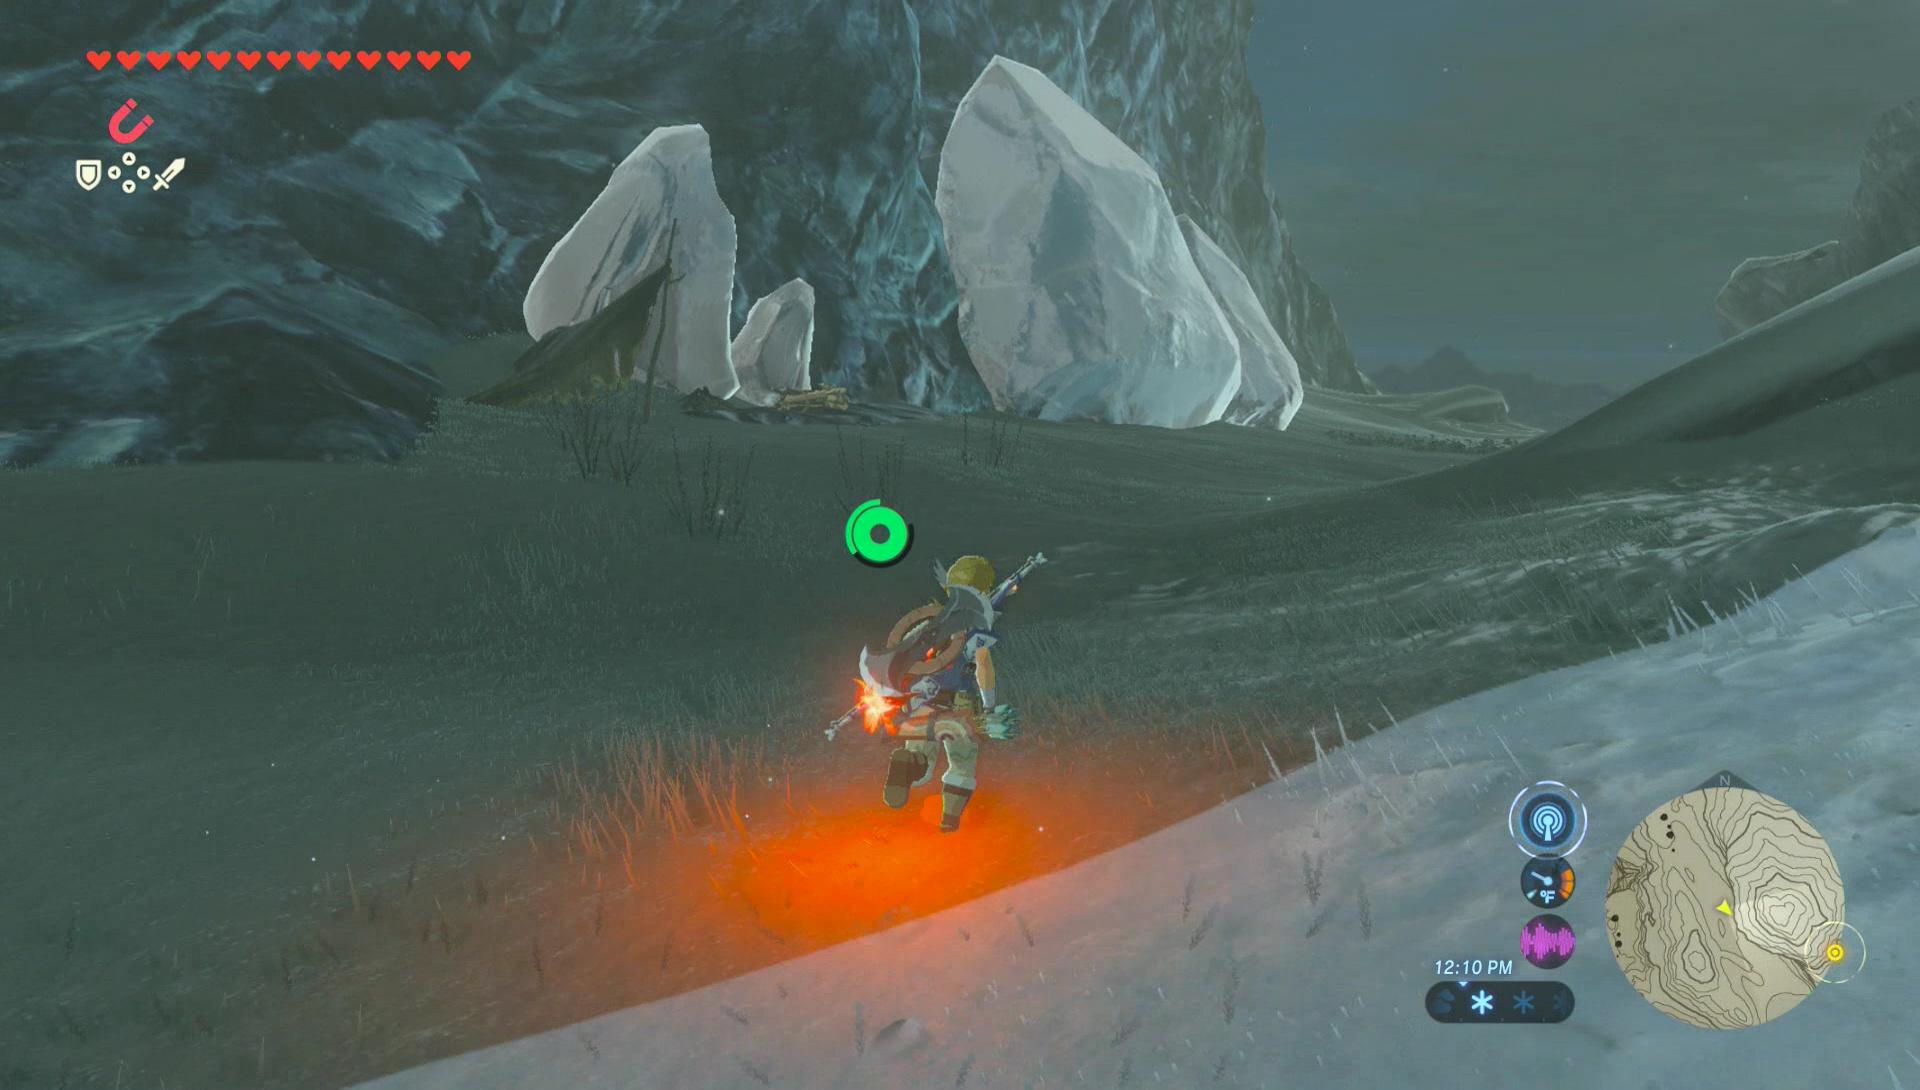 Goma Asaagh Shrine Guide - Zelda Dungeon